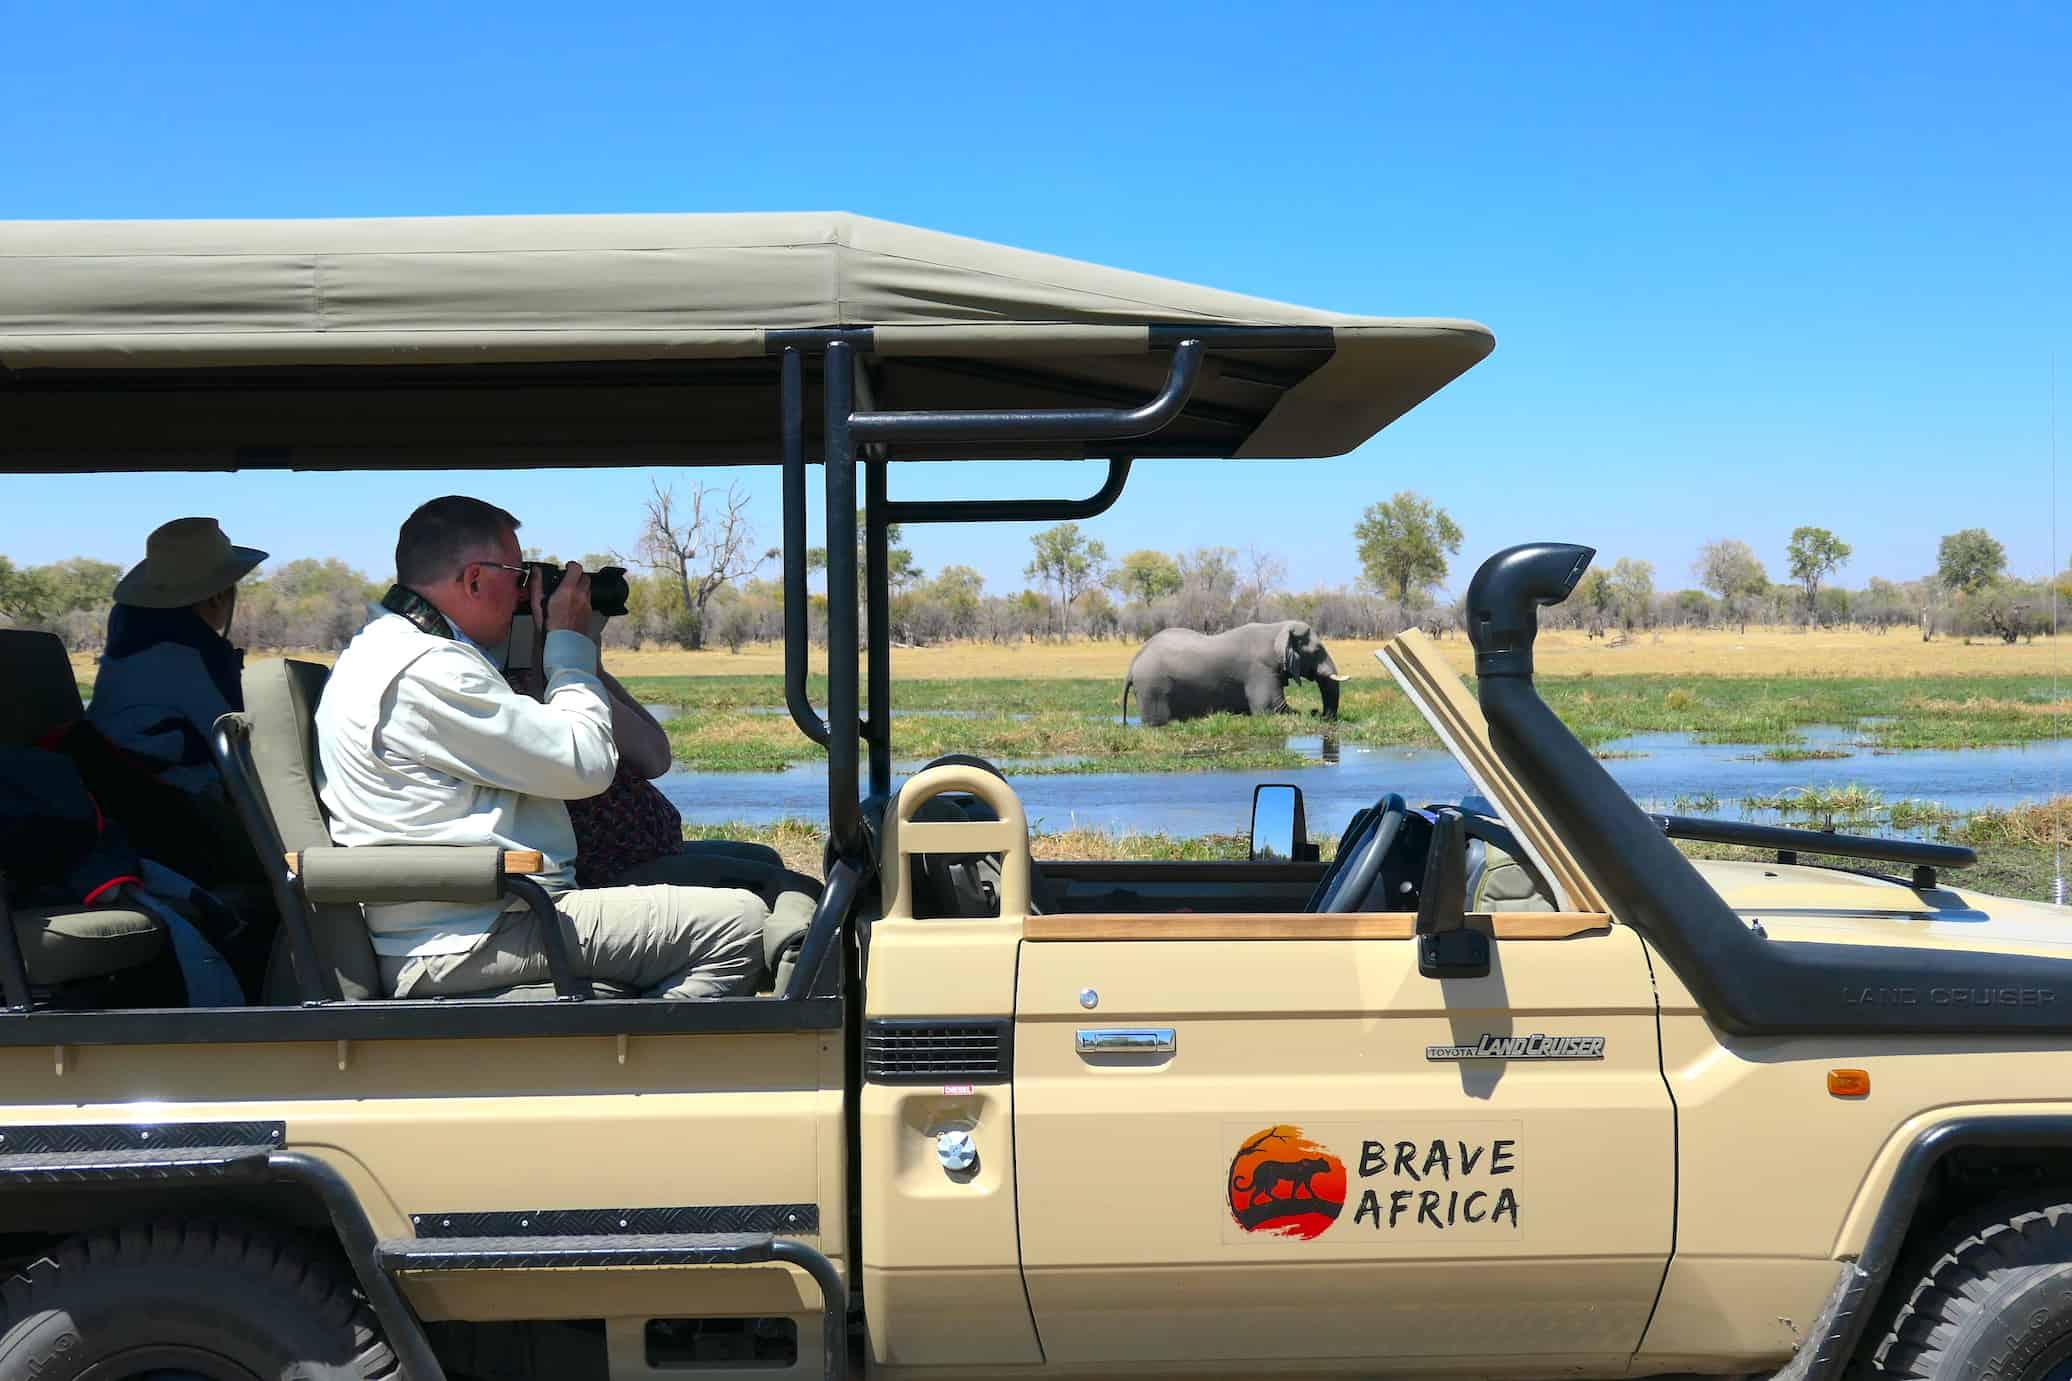 Brave Africa Safari Vehicle